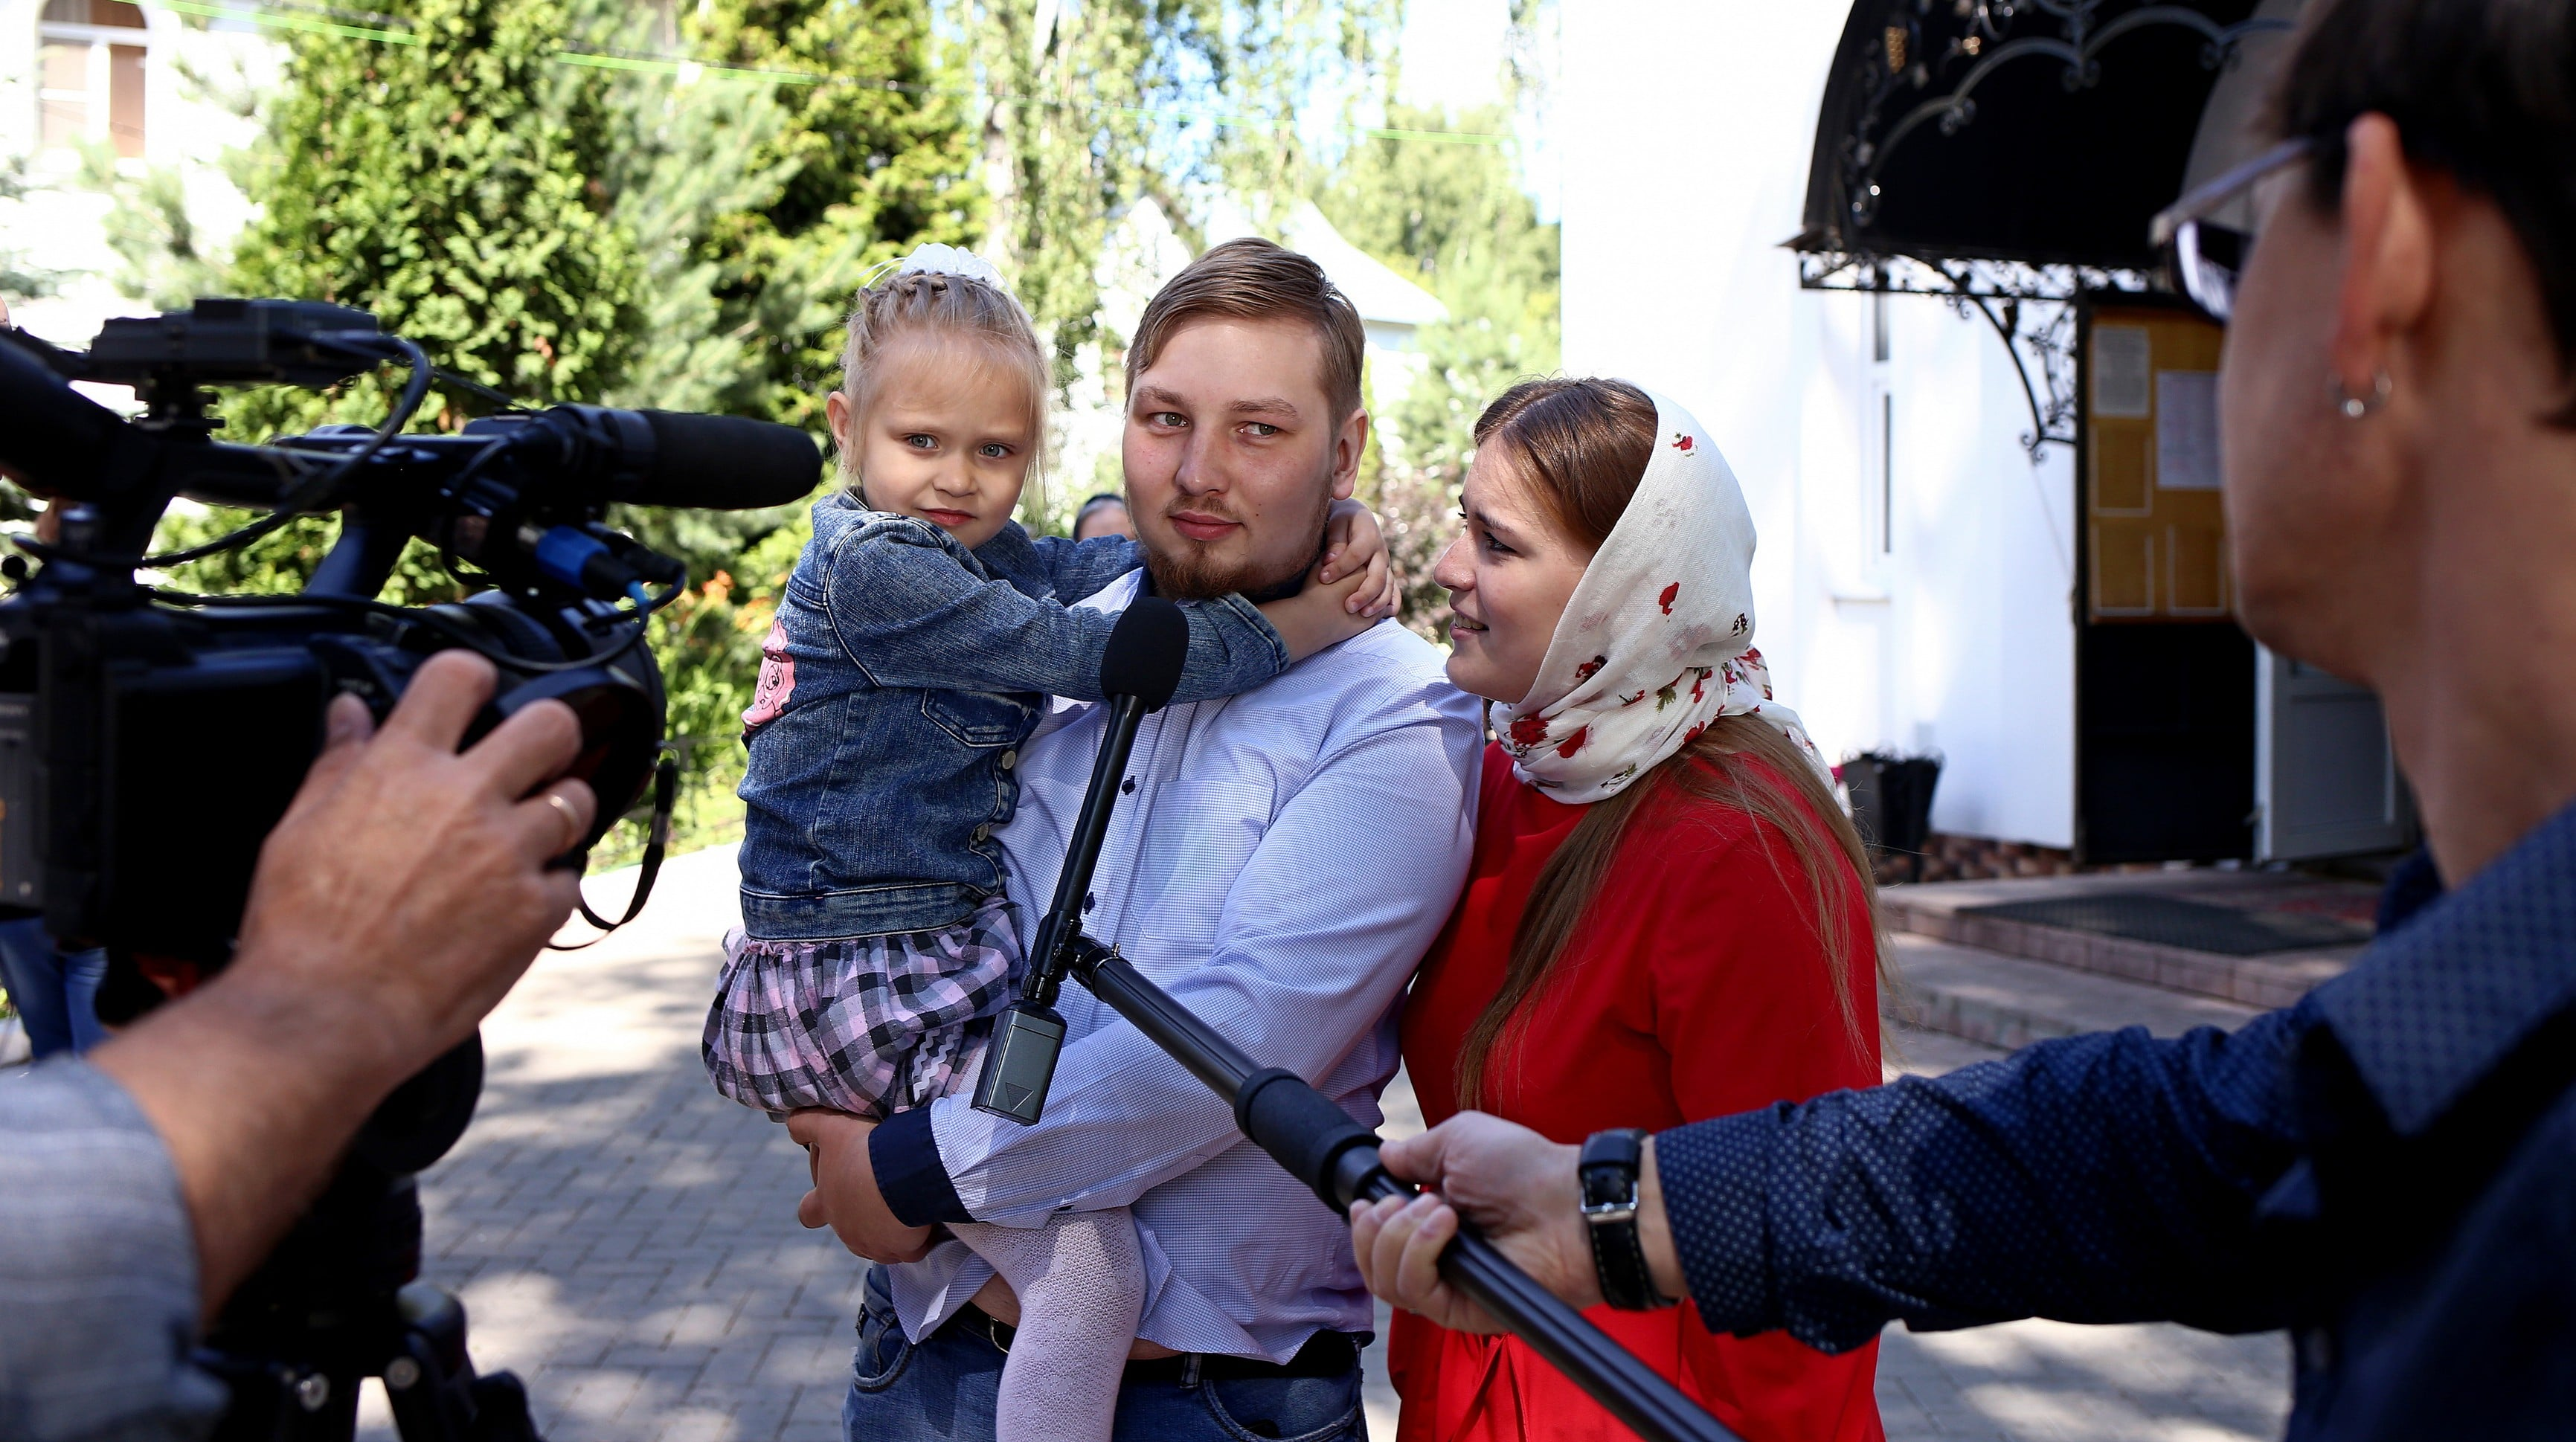 http://monuspen.ru/photoreports/14b72a43bf568736ebc953d1a903f308.jpg